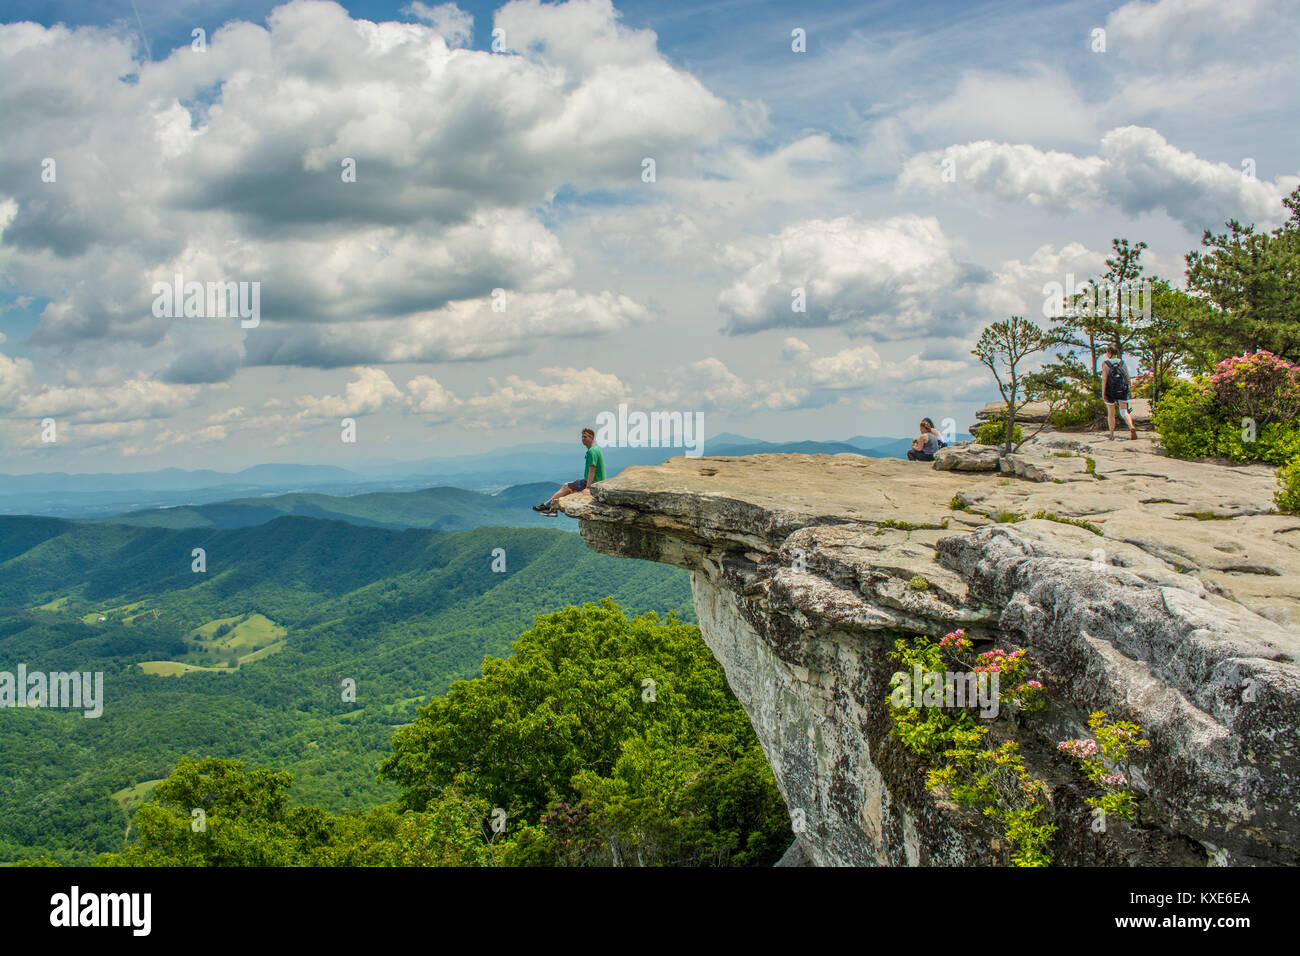 Hiking McAfee Knob Appalachian Trail - Stock Image